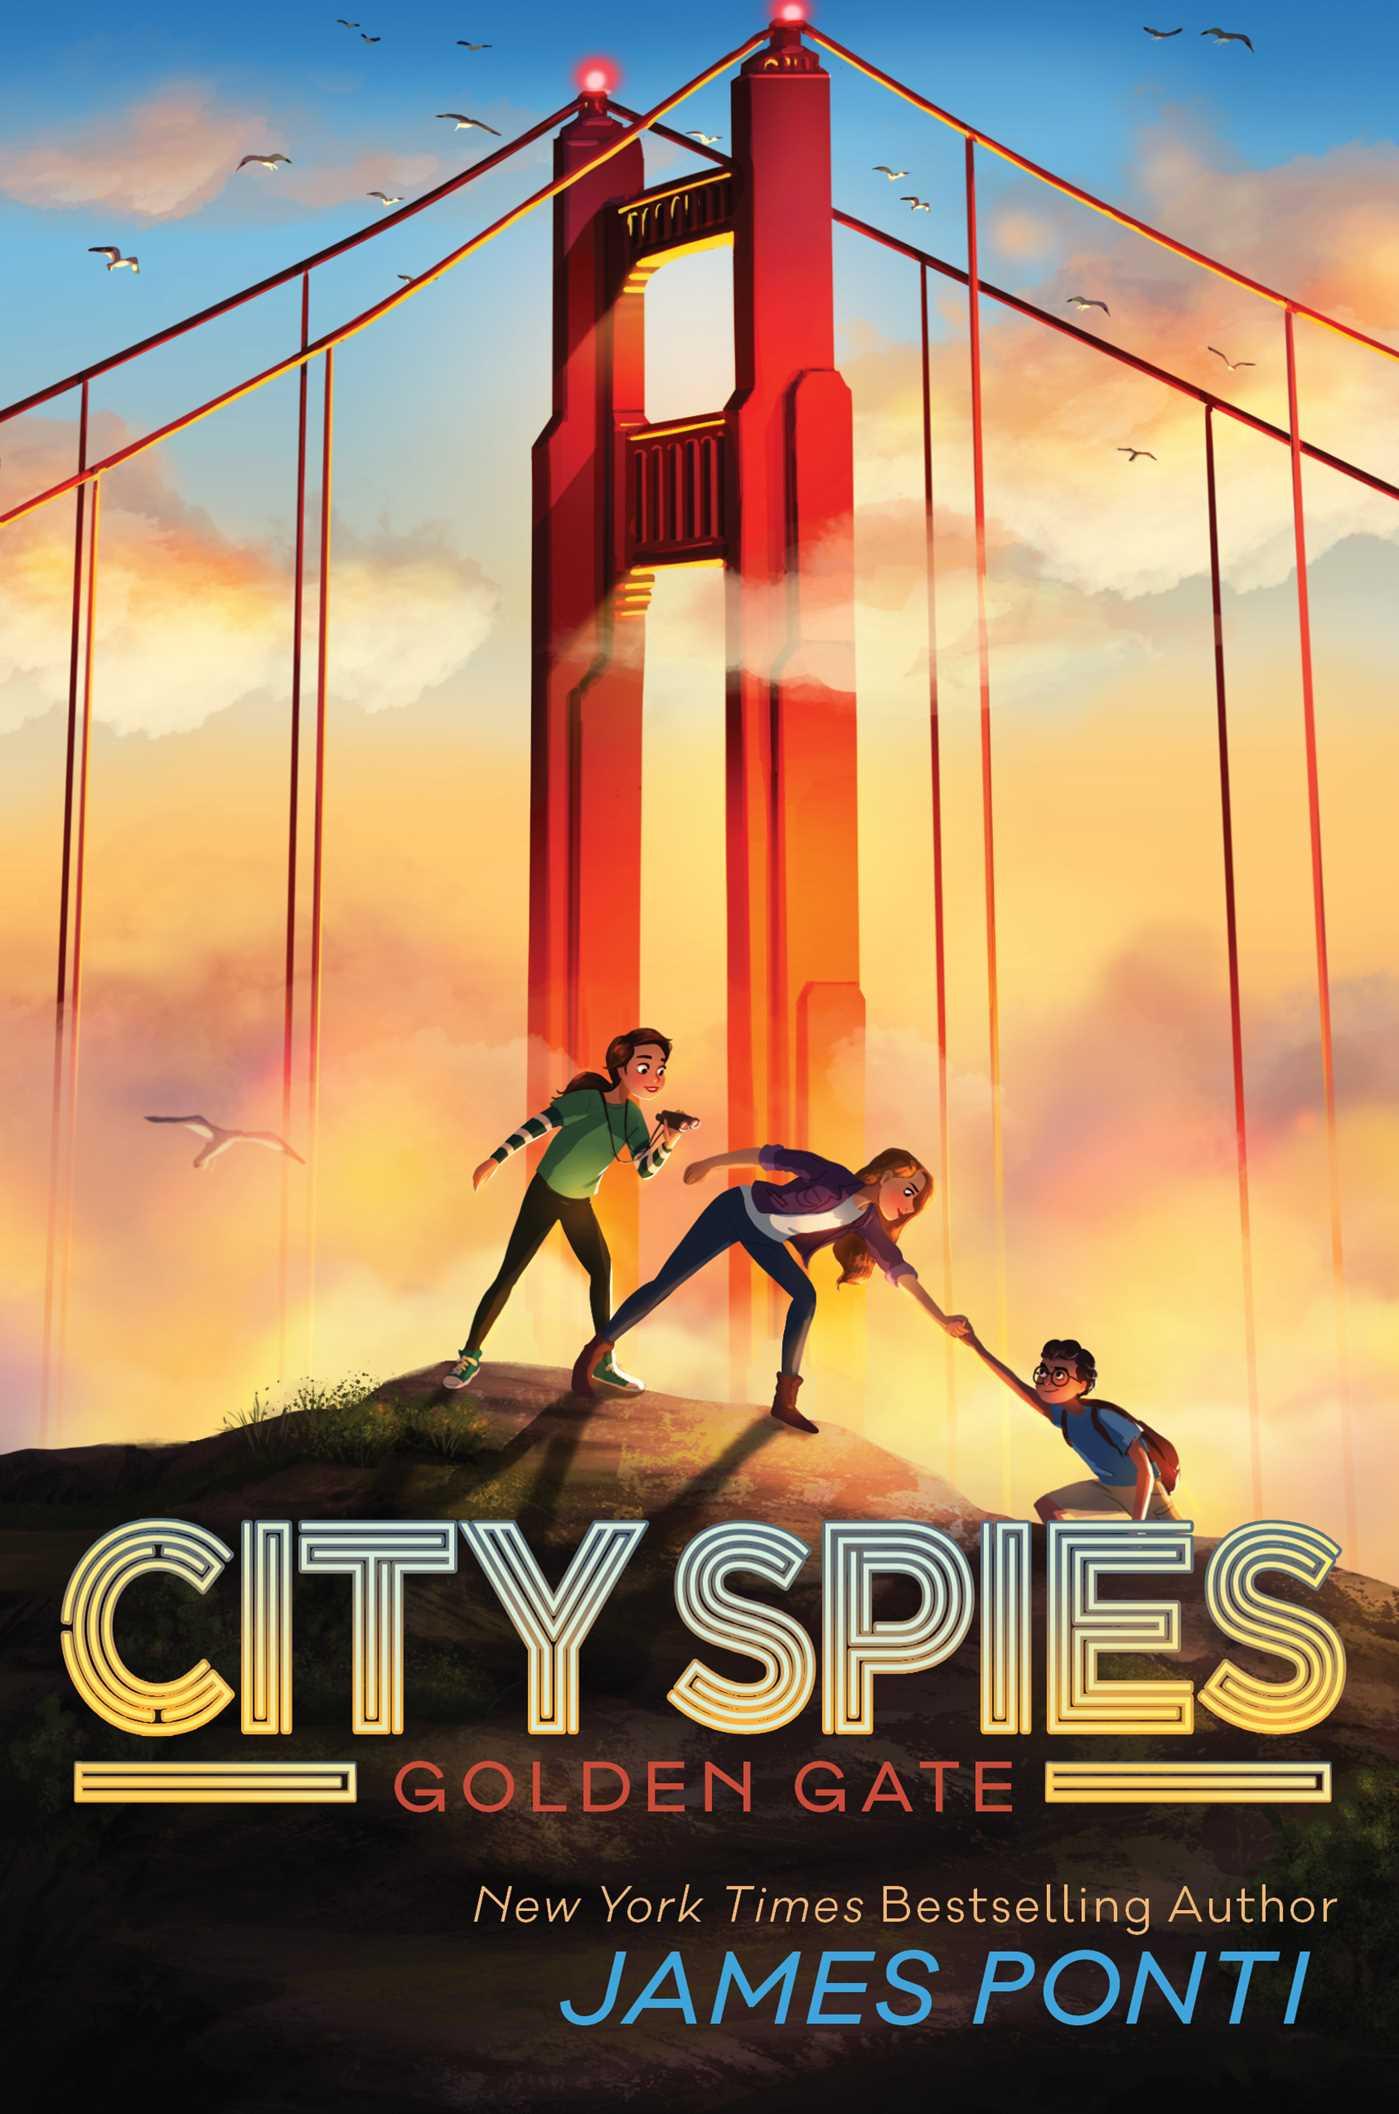 Golden Gate (City Spies, #2)